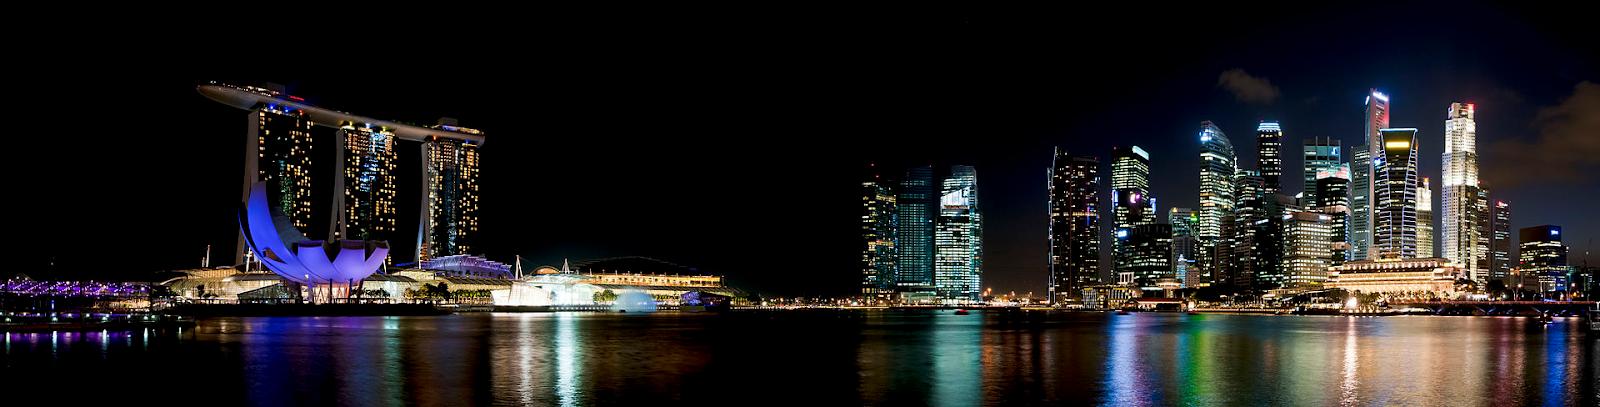 marina bay night skyline singapore flyspaces